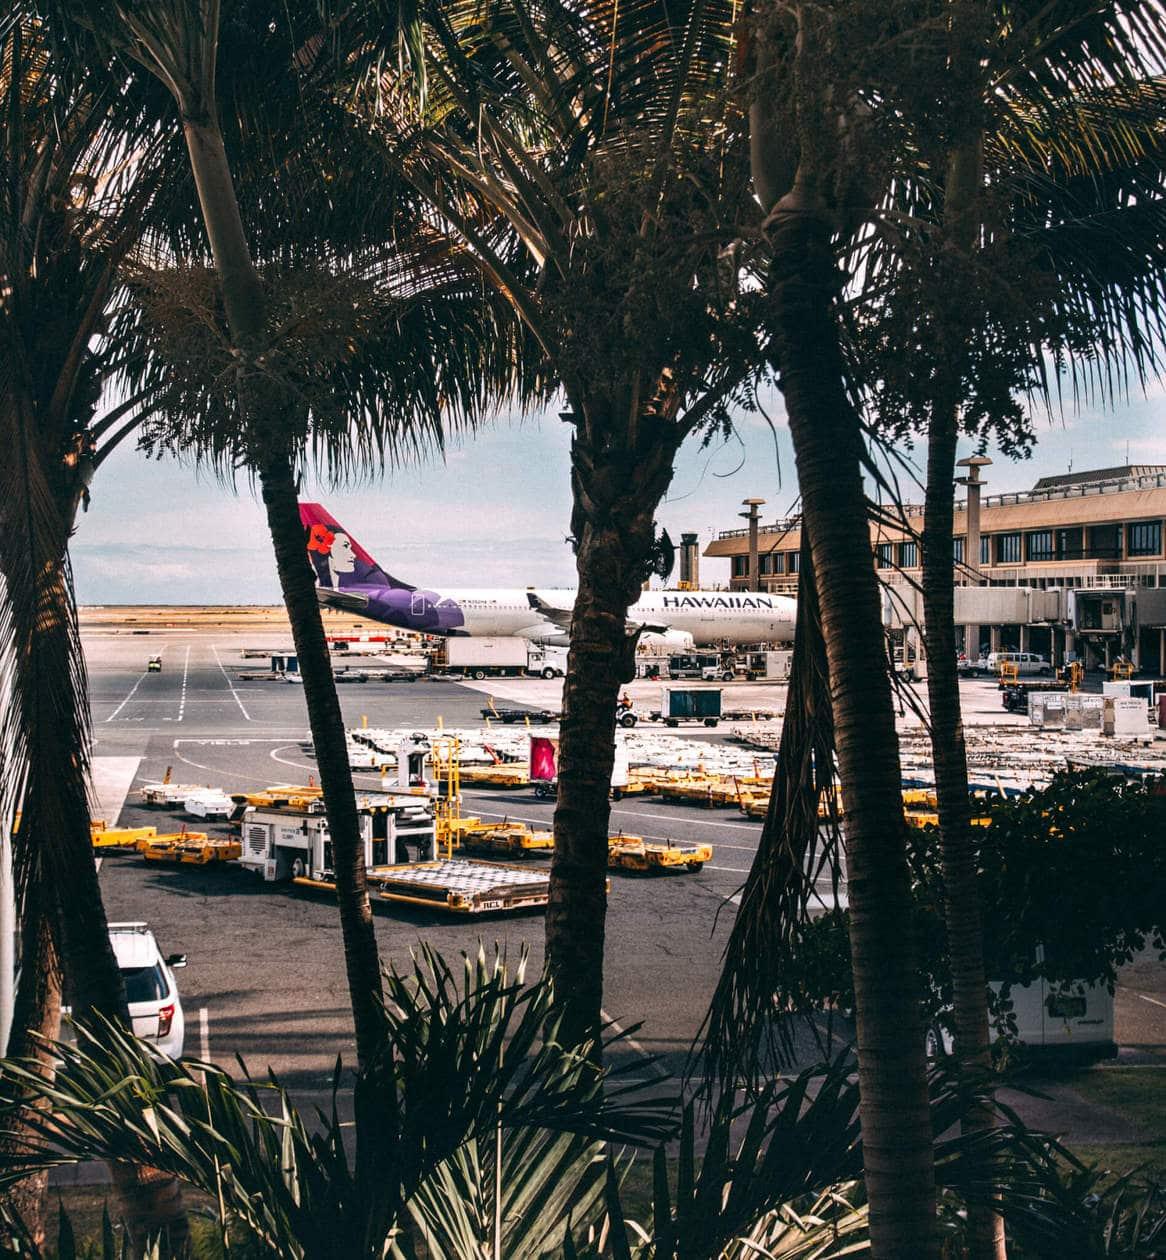 Oahu Airport